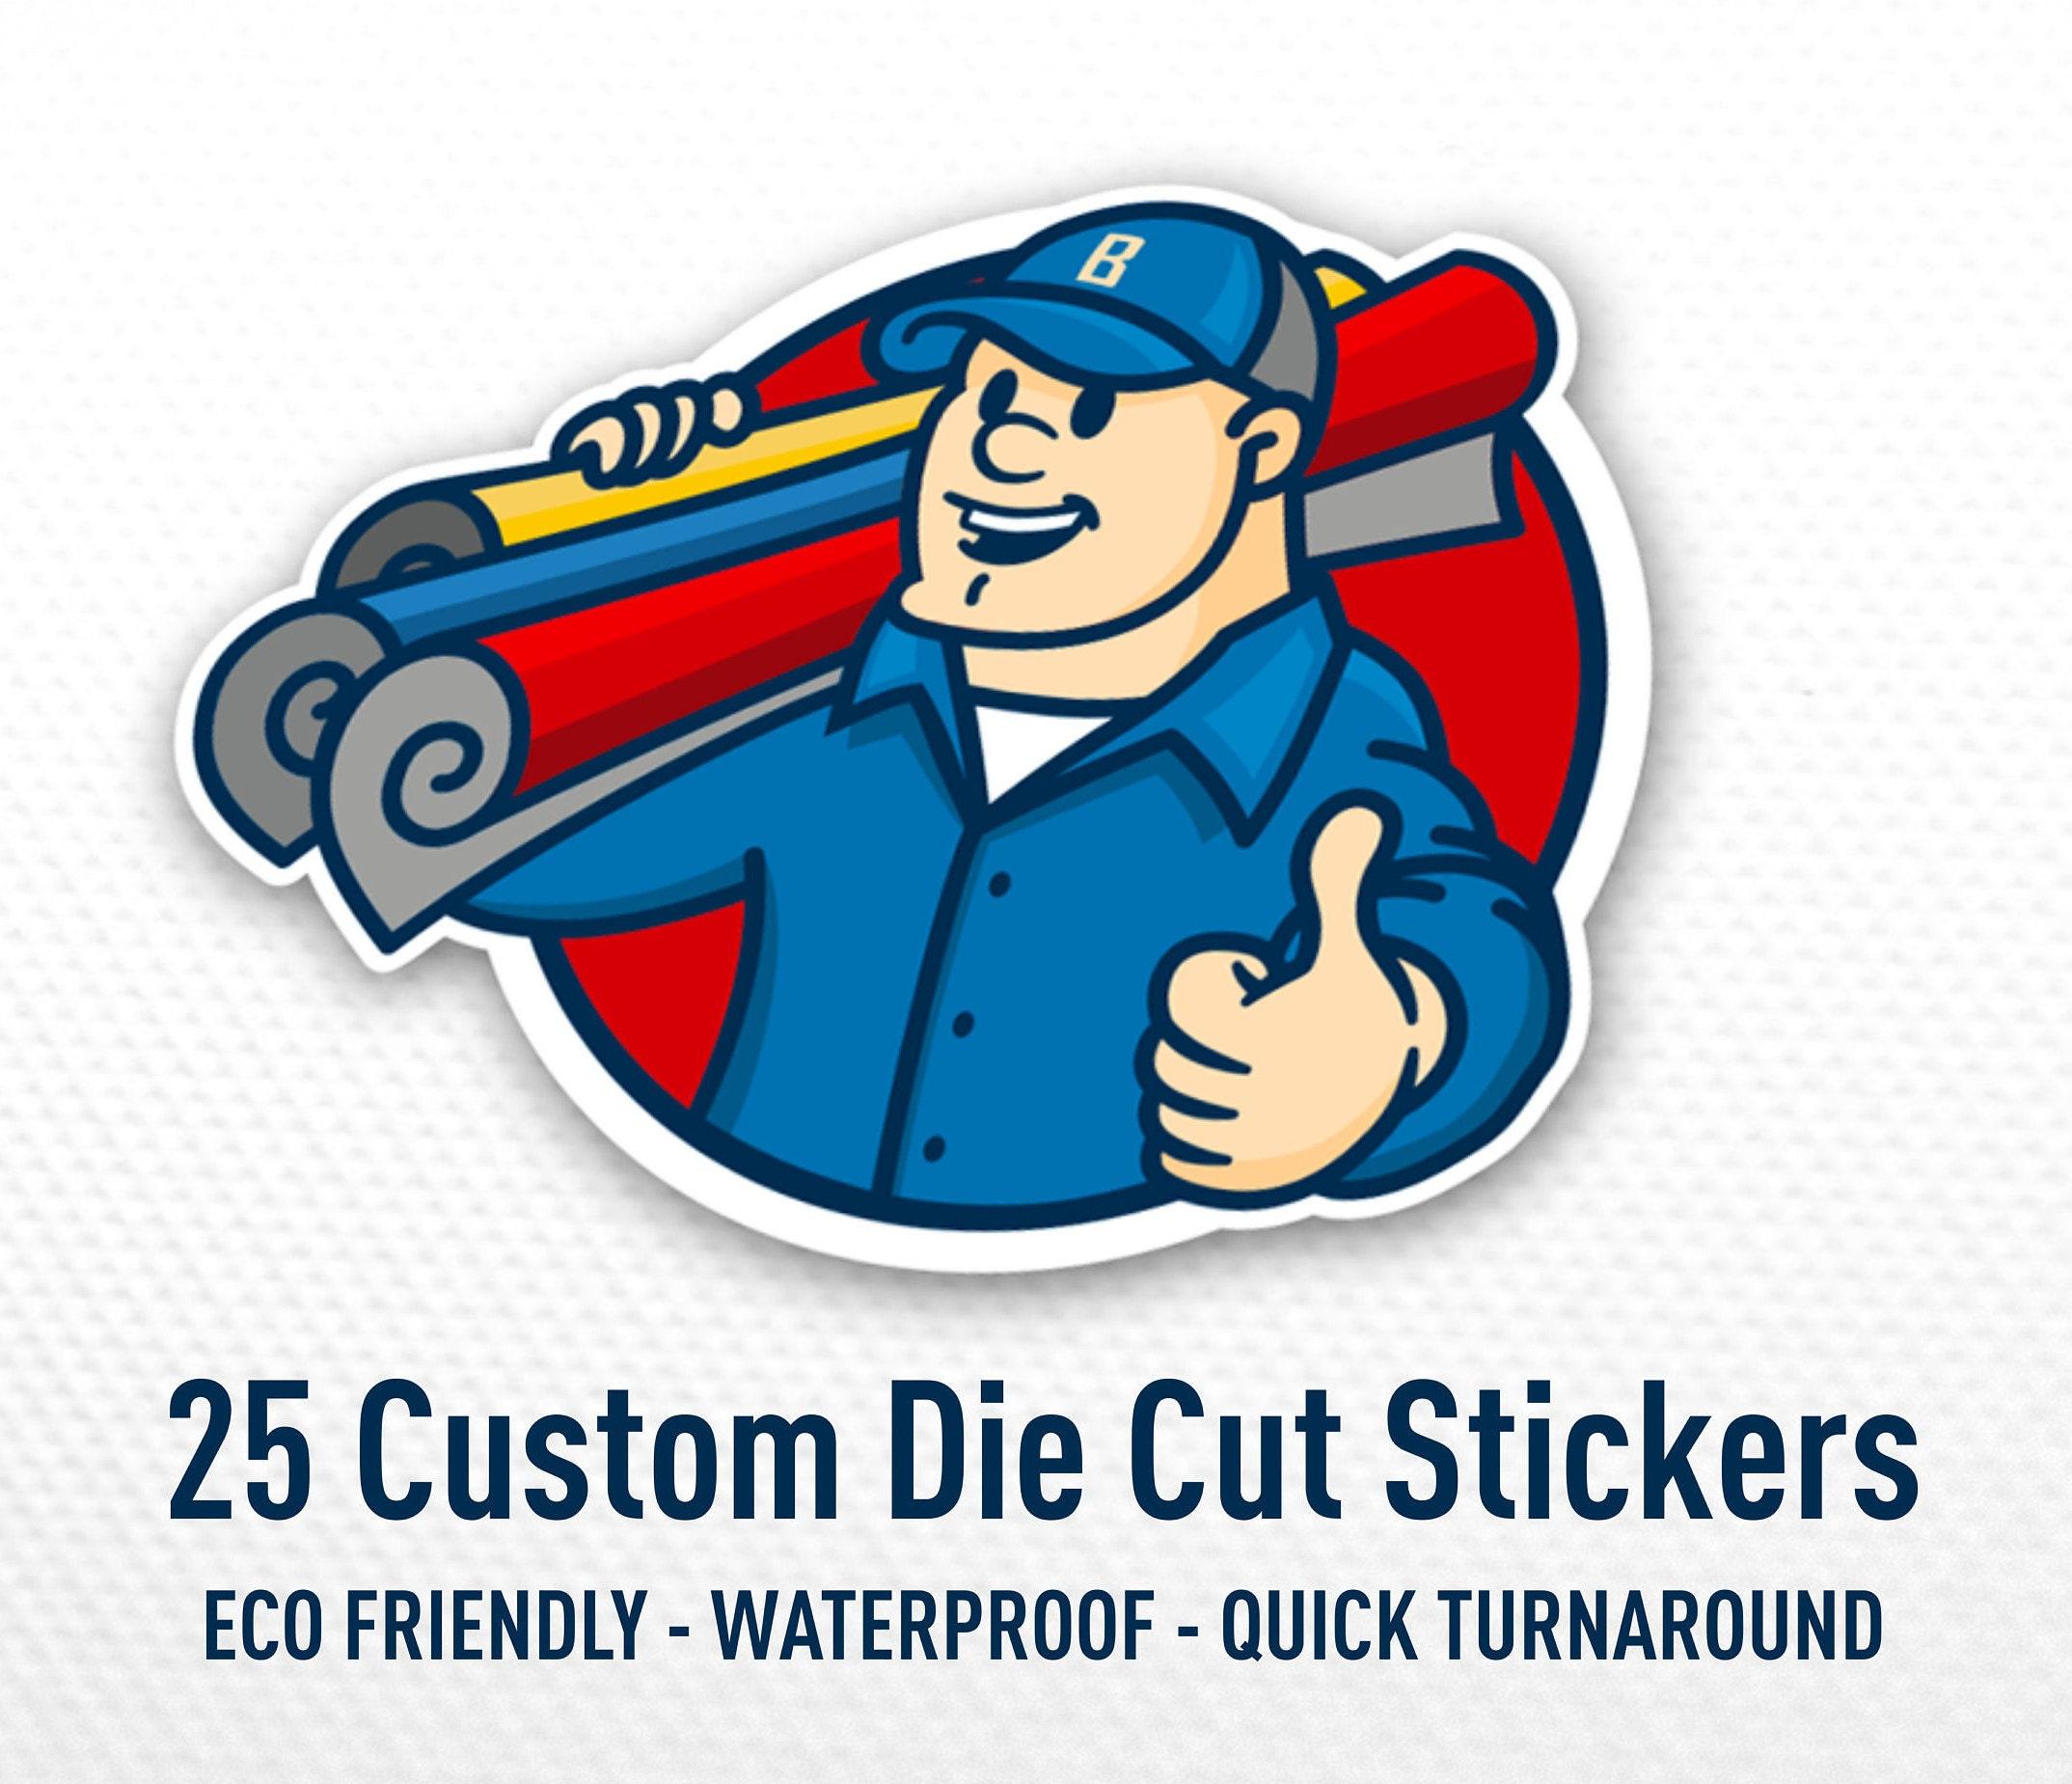 Custom shape bulk stickers waterproof stickers 25 vinyl stickers cut to shape custom made product labels